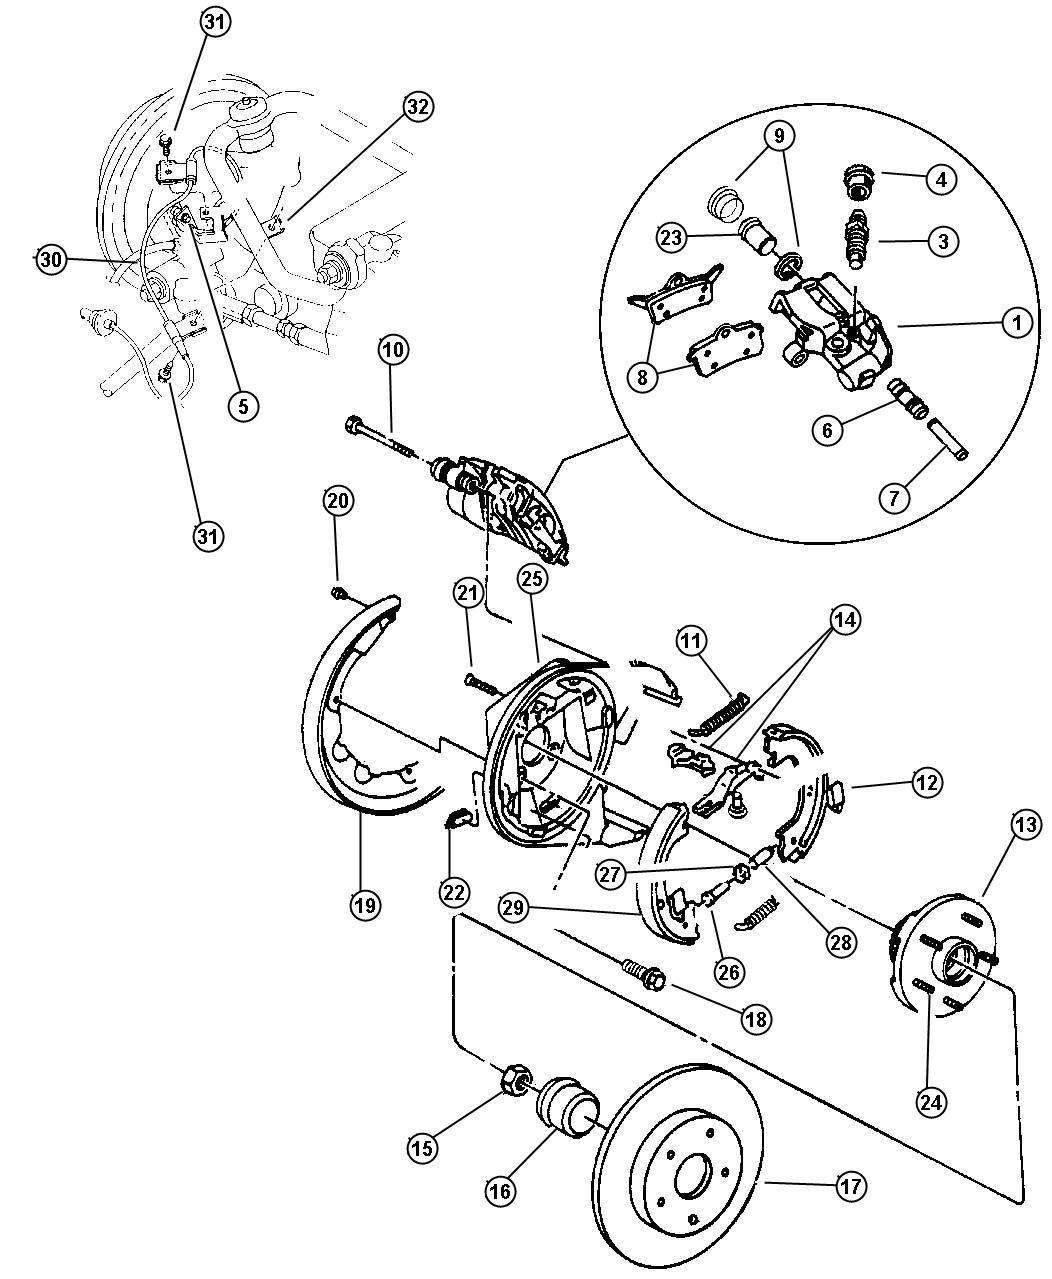 2006 Chrysler Sebring Adapter, adapter assembly. Parking